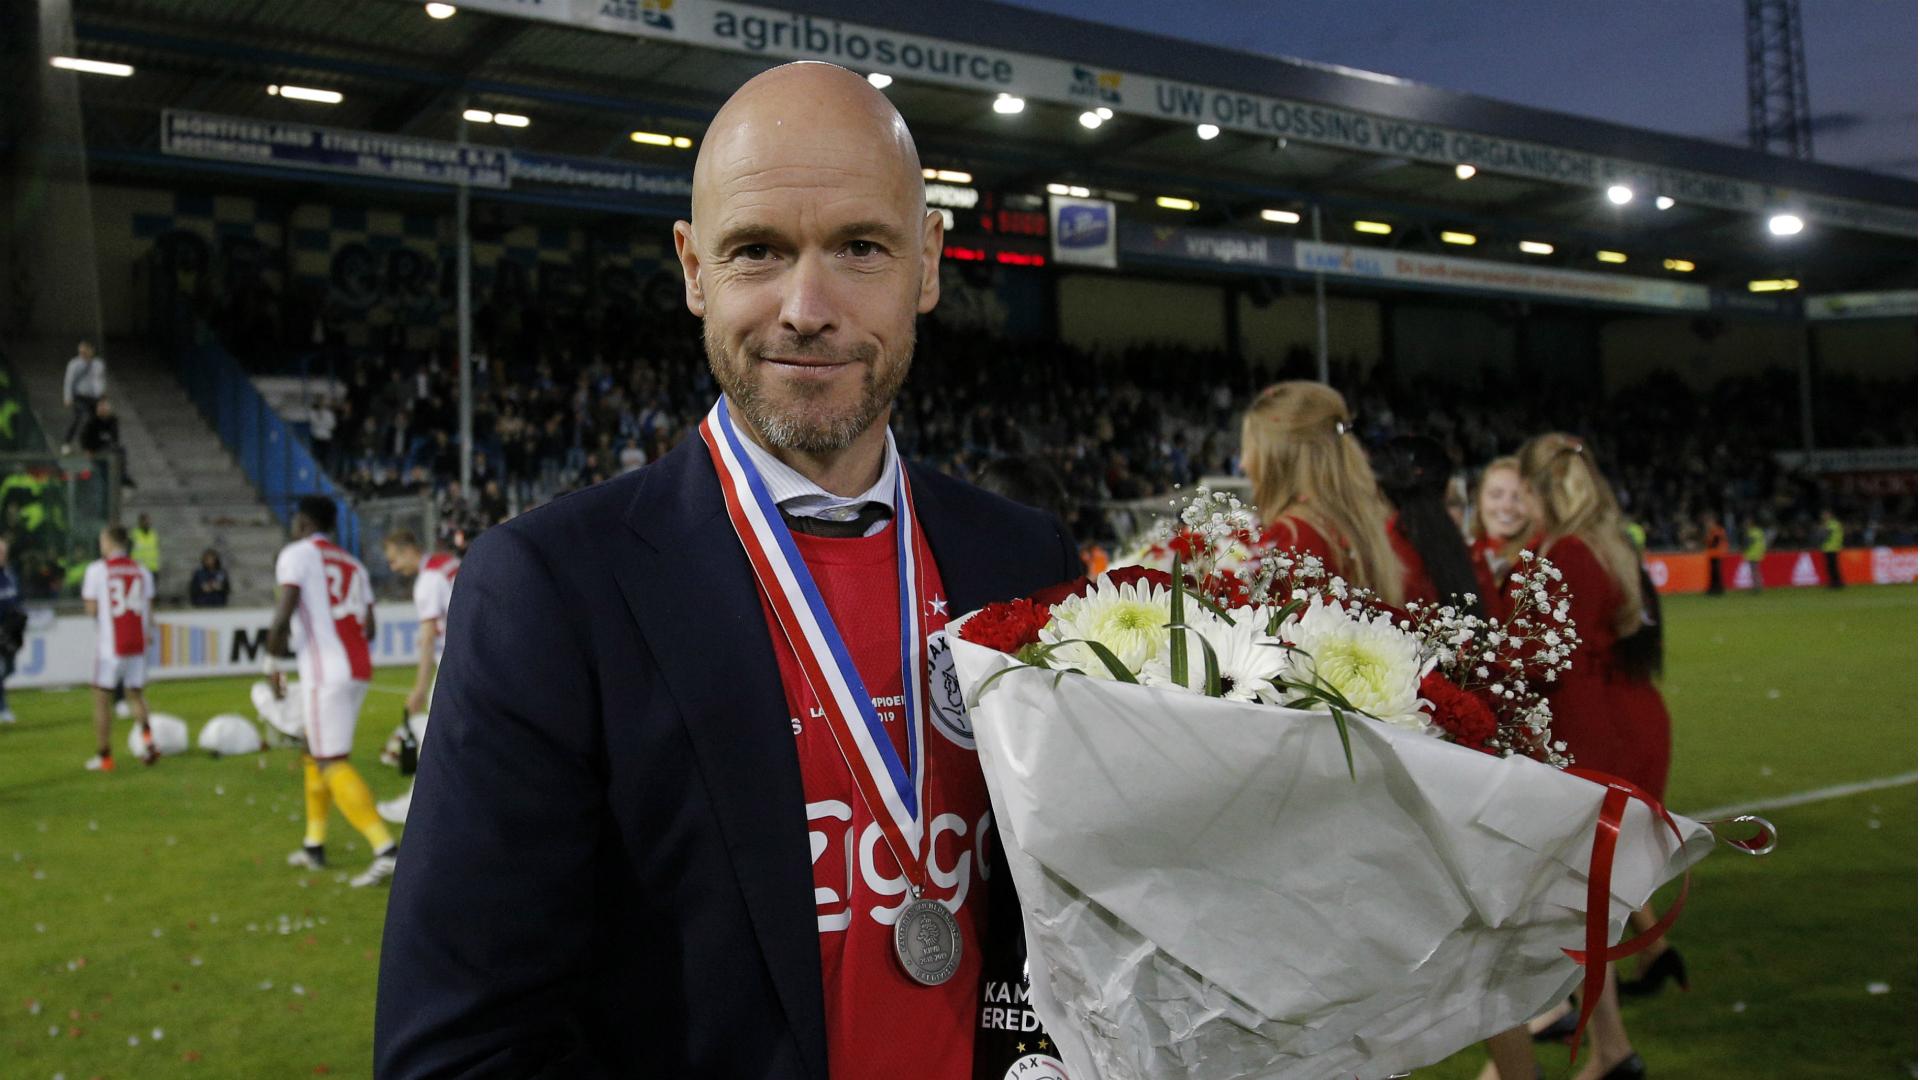 After Abdelhak Nouri was left with brain damage, Erik ten Hag dedicated Ajax's Eredivisie title triumph to 'Appie'.